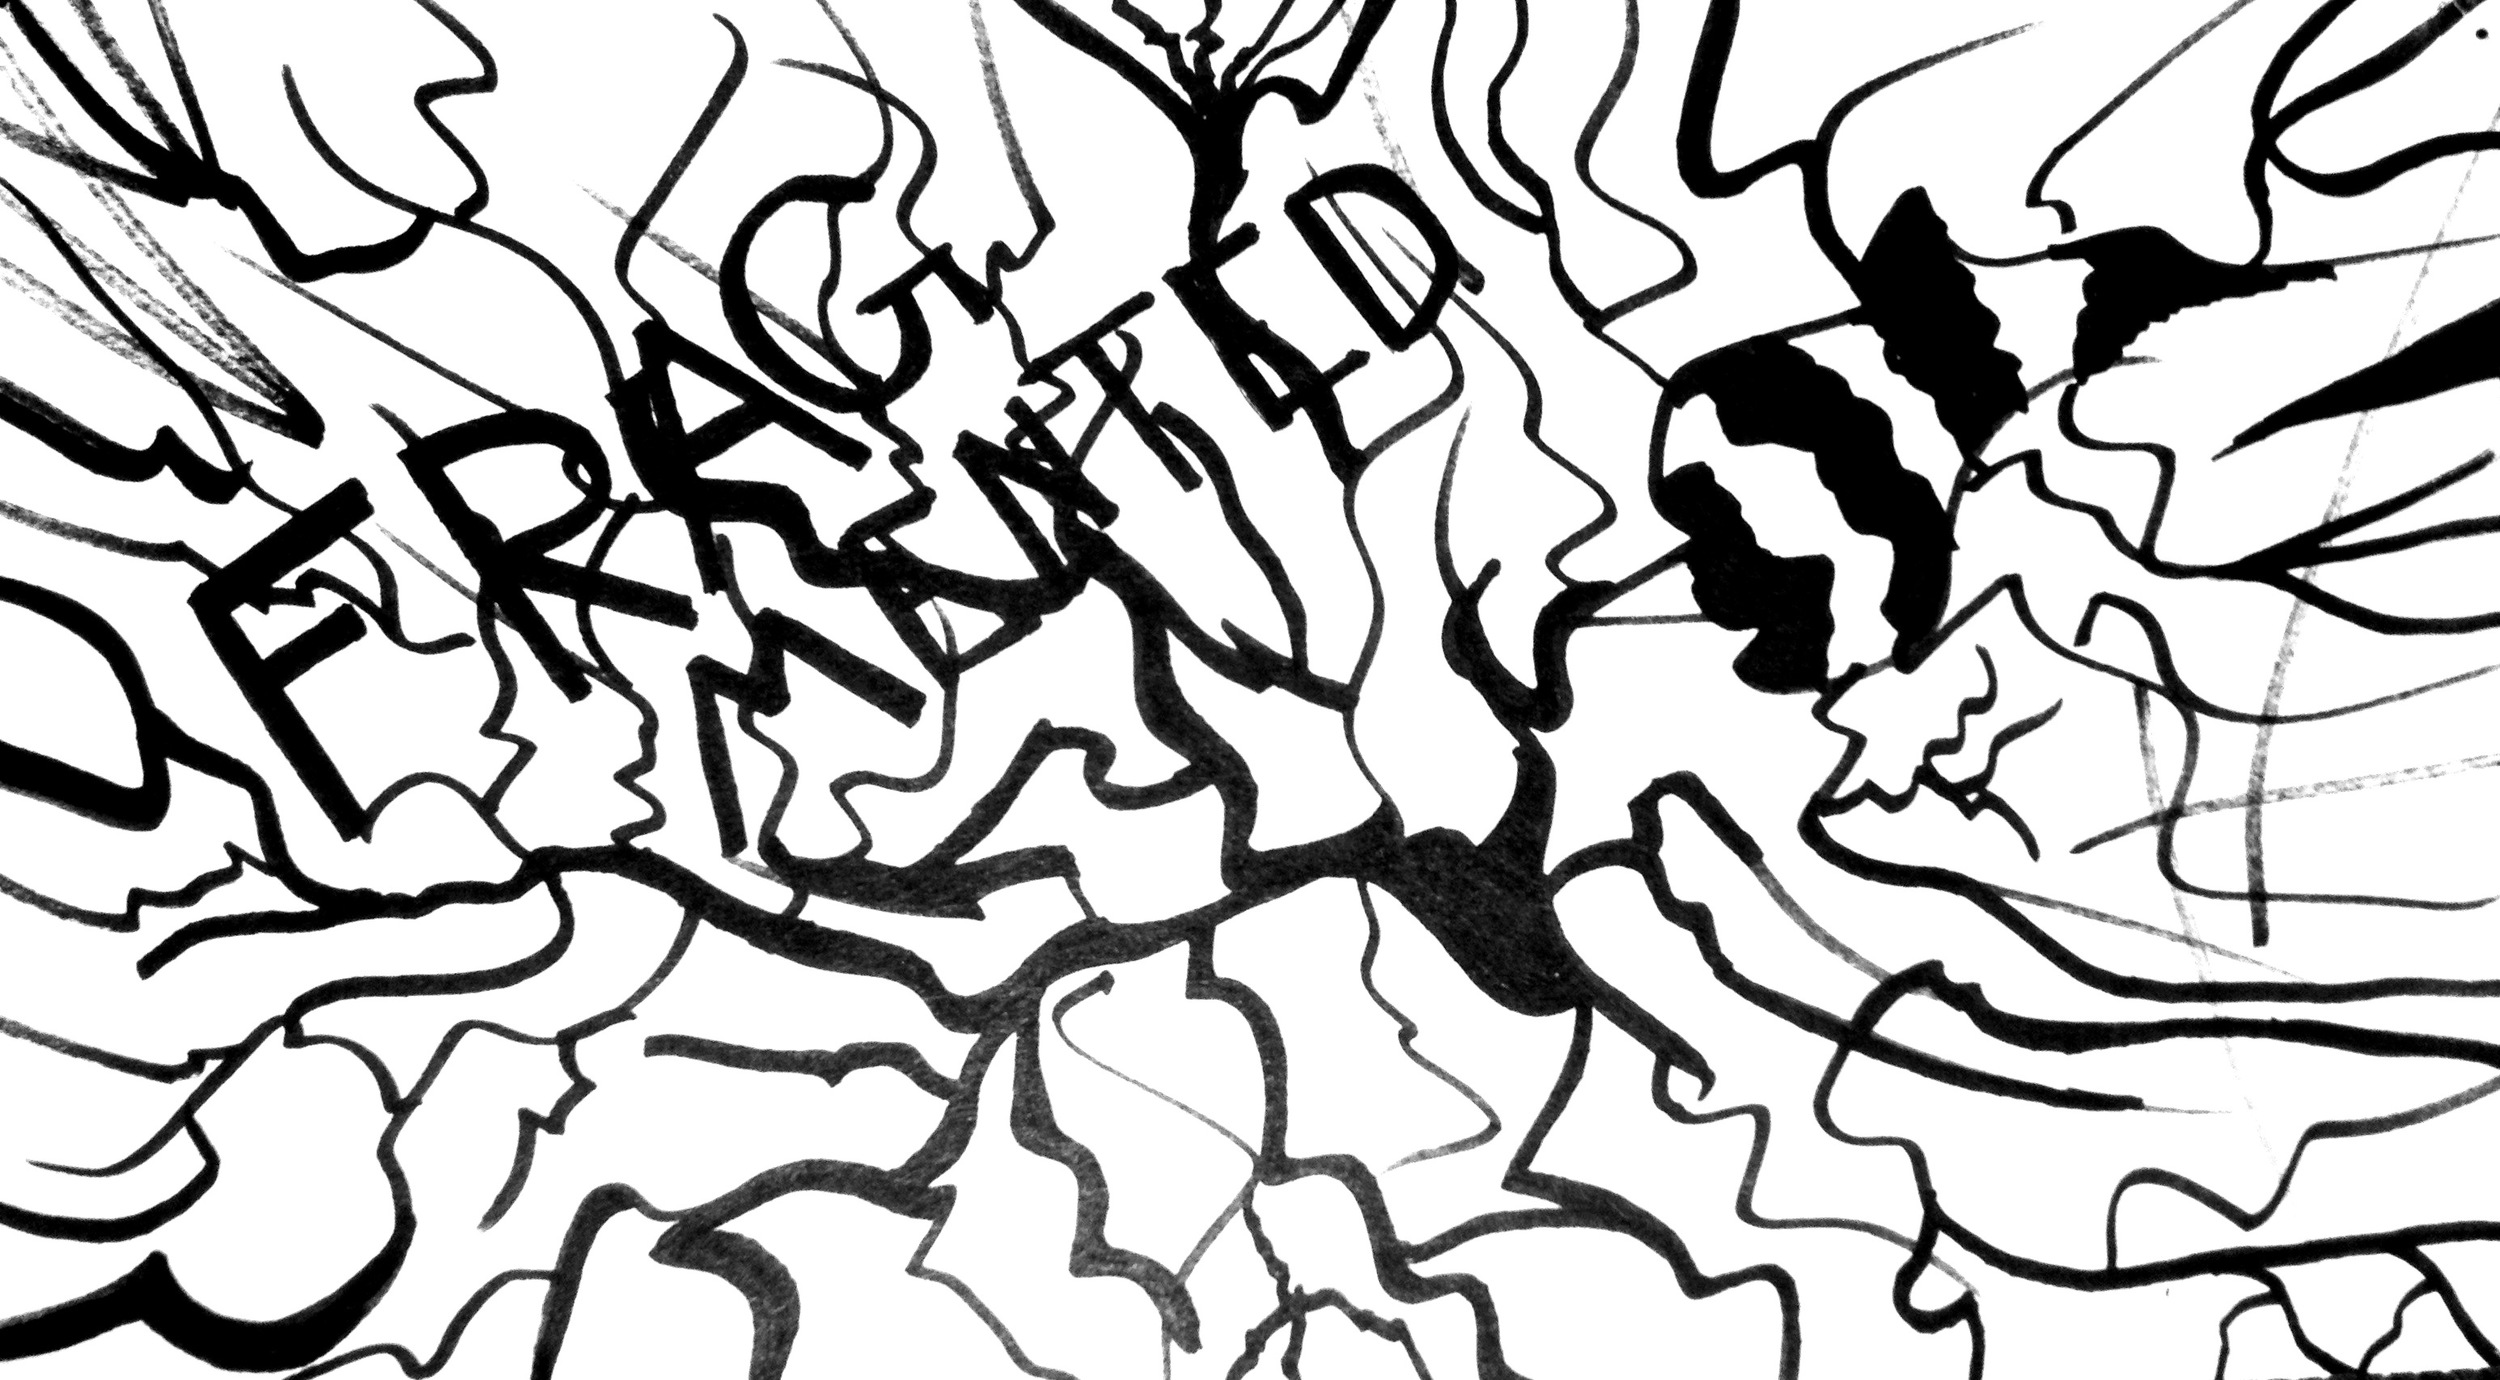 drawing_fragmented.jpeg